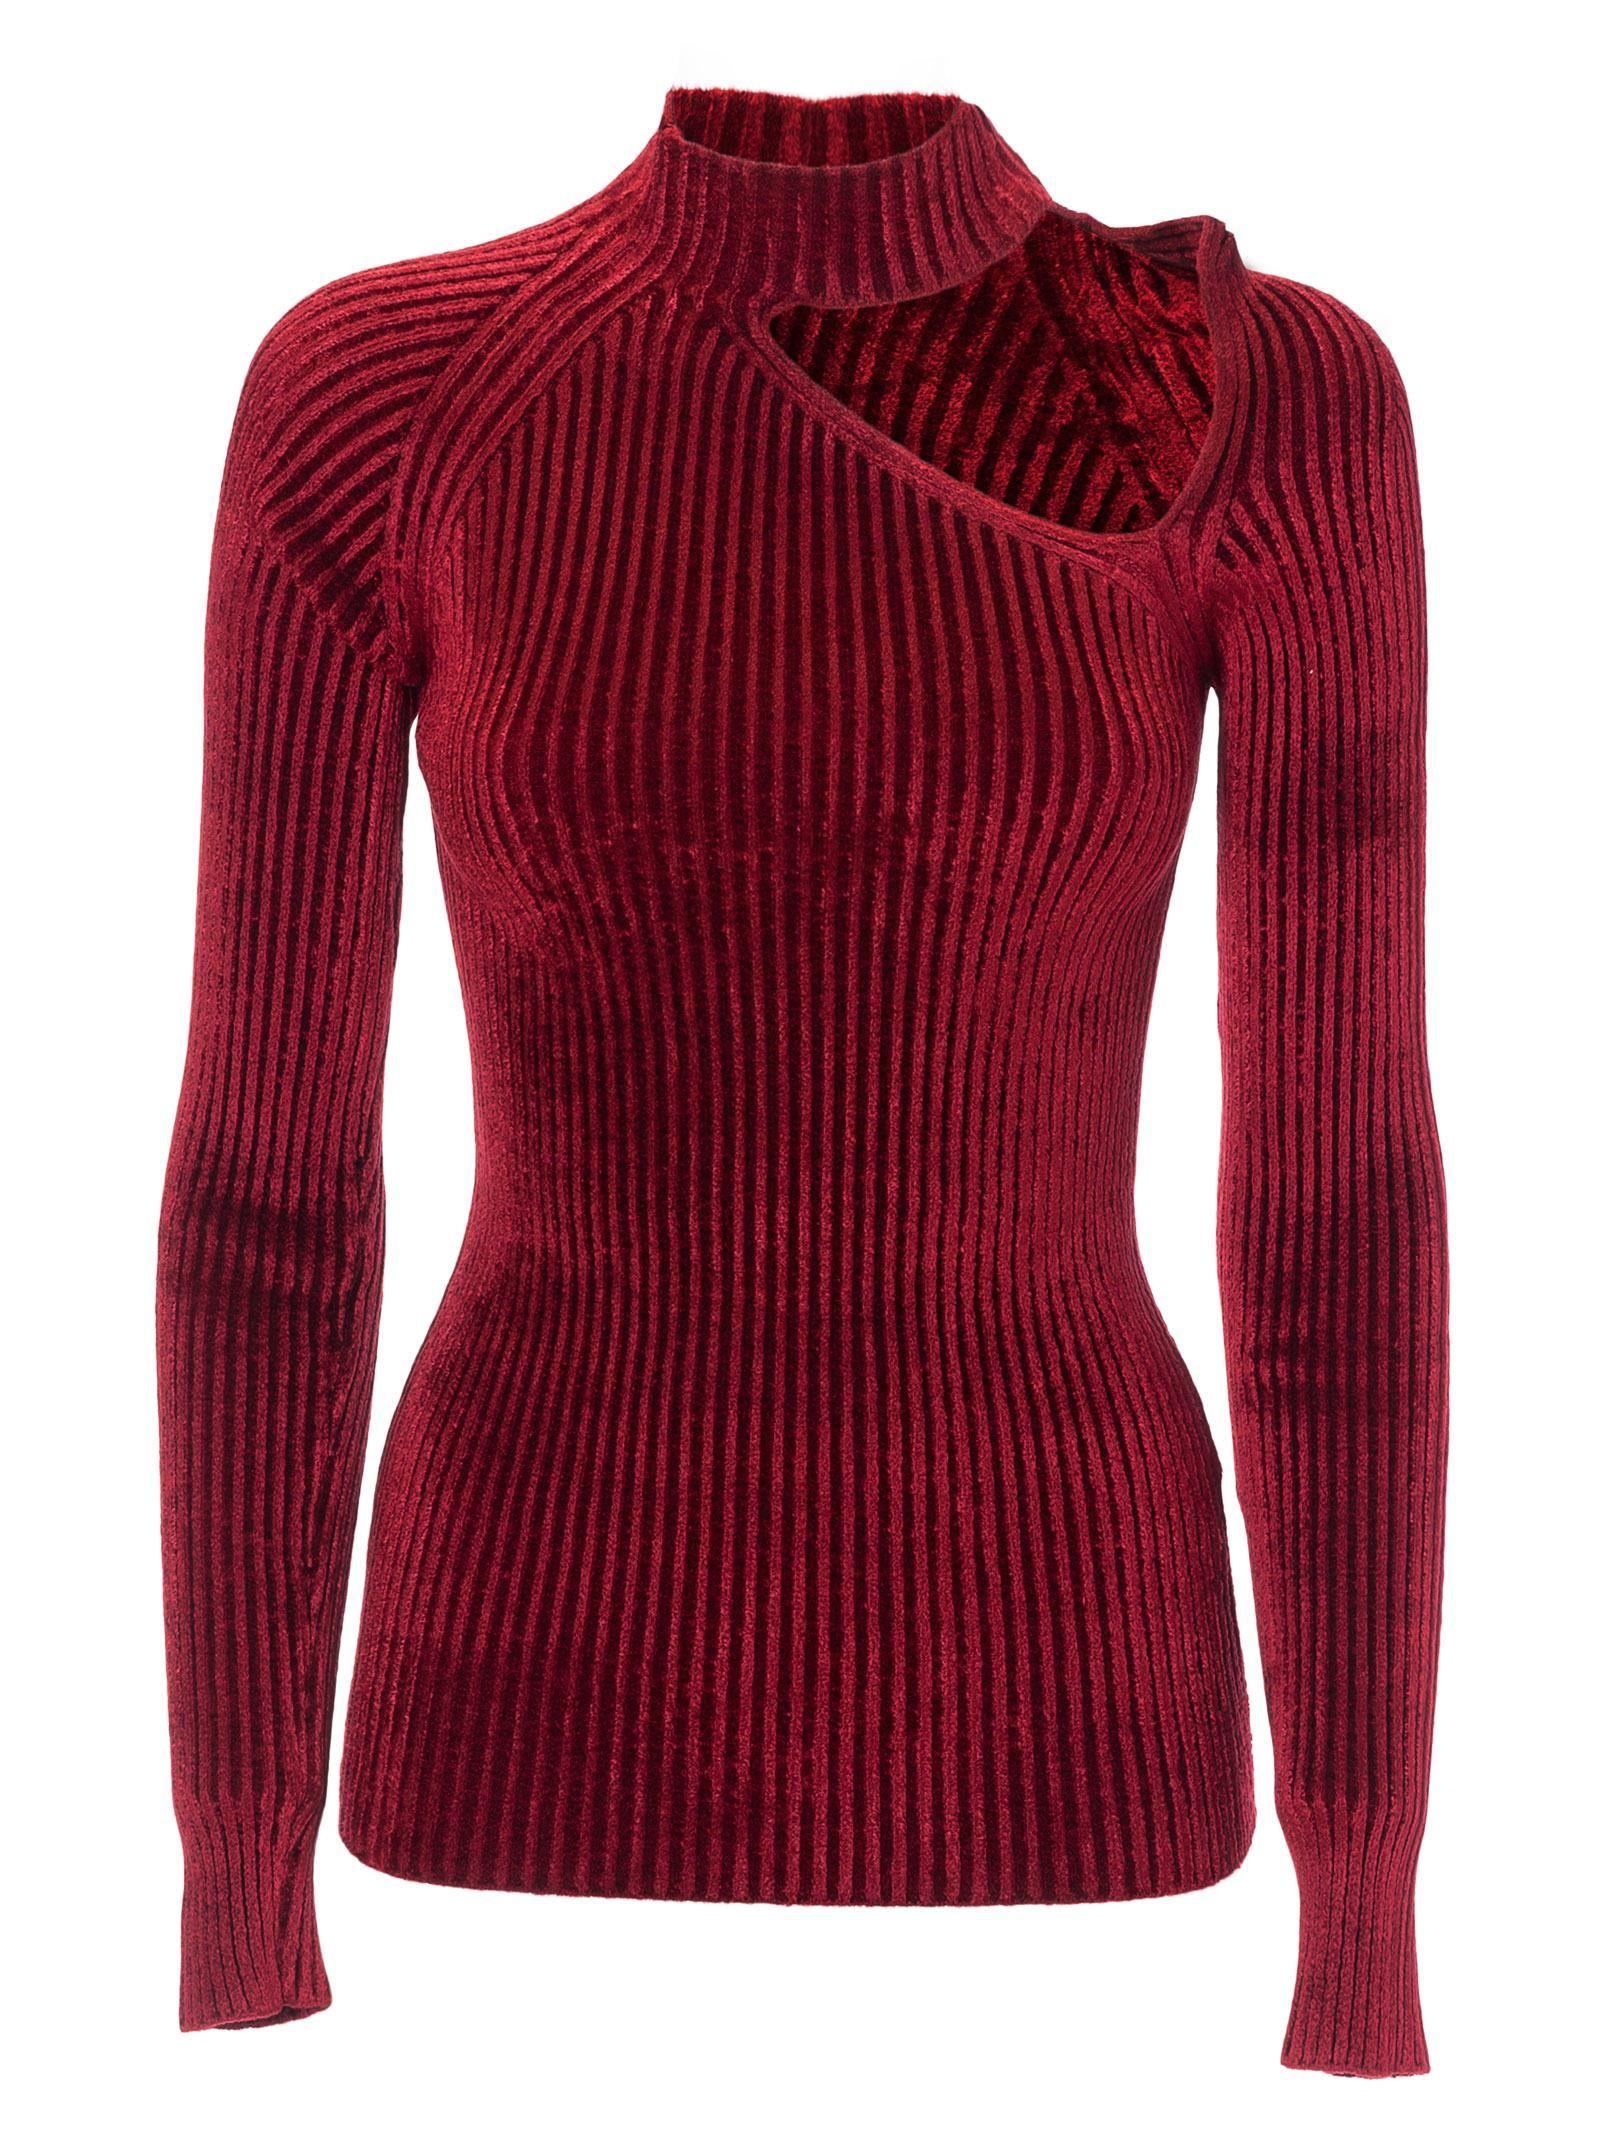 Mrz Knitted Sweater